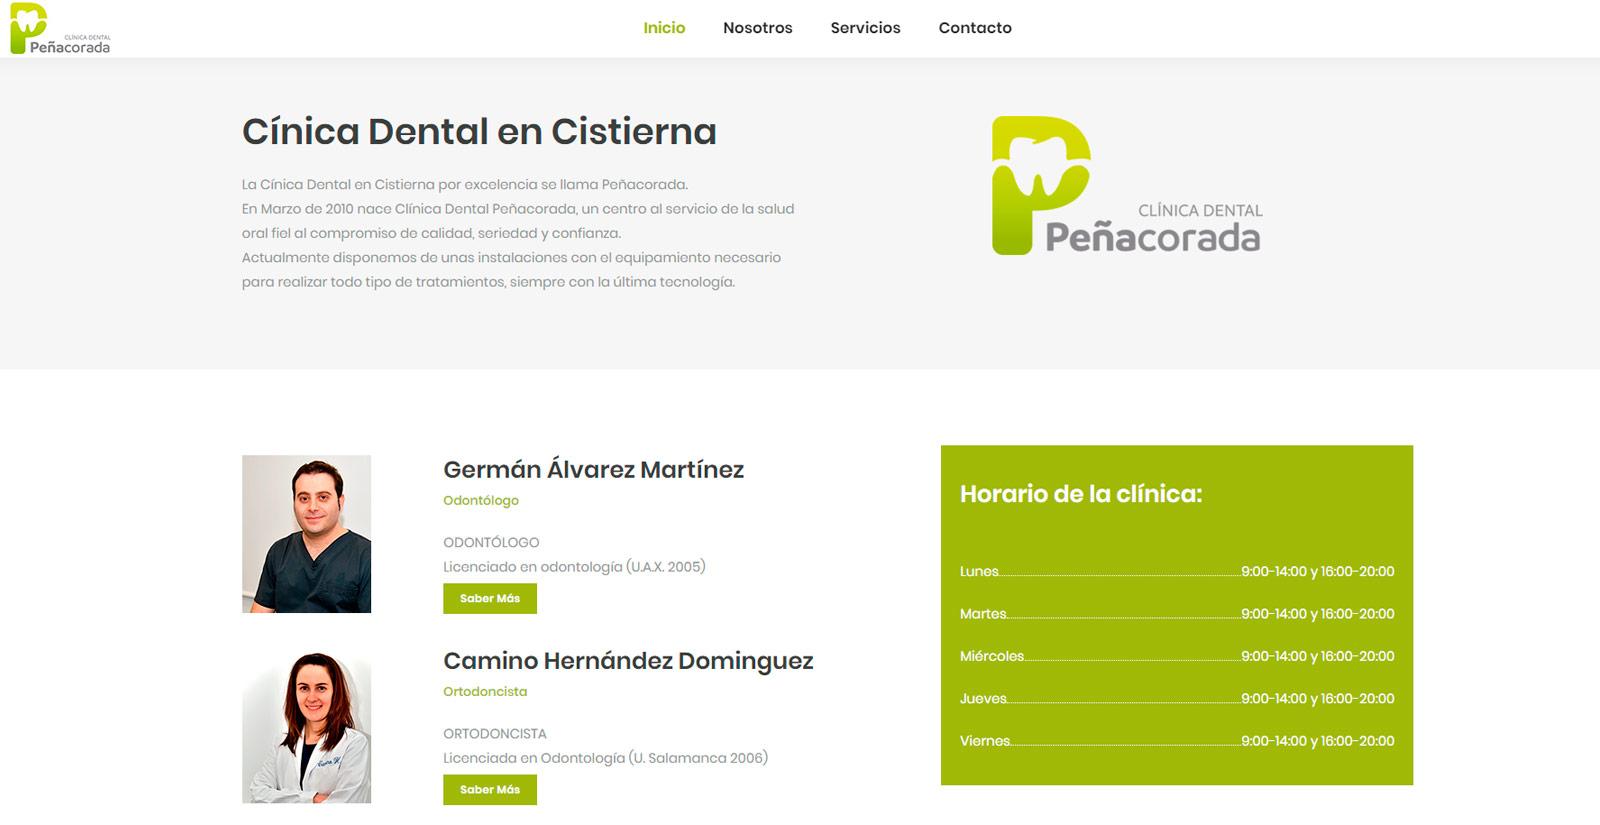 Clínica dental Peñacorada León